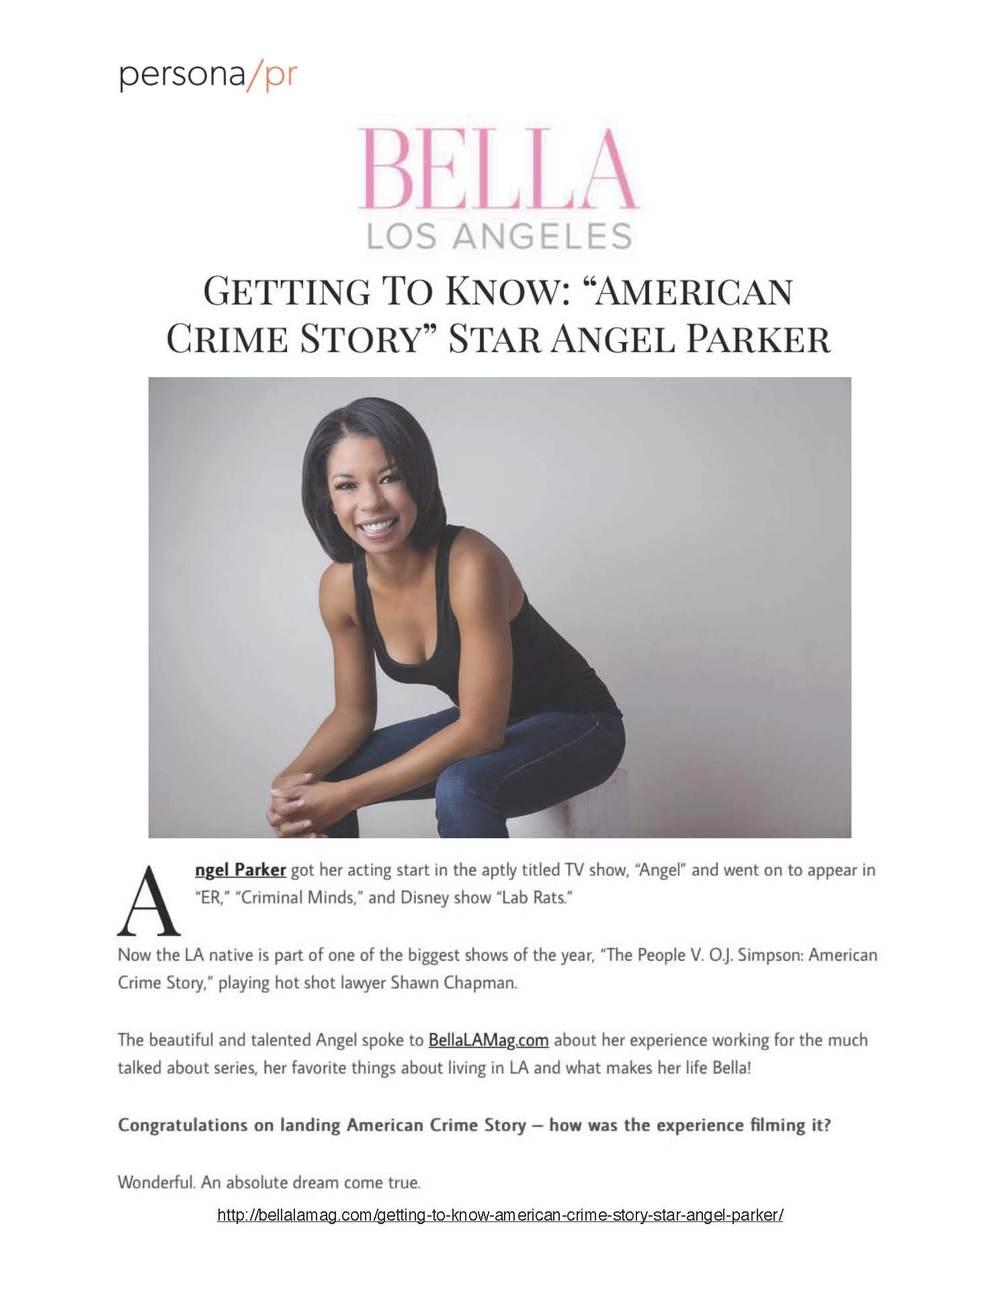 AngelParker-BELLA[LA]-03.09.16_Page_1.jpg